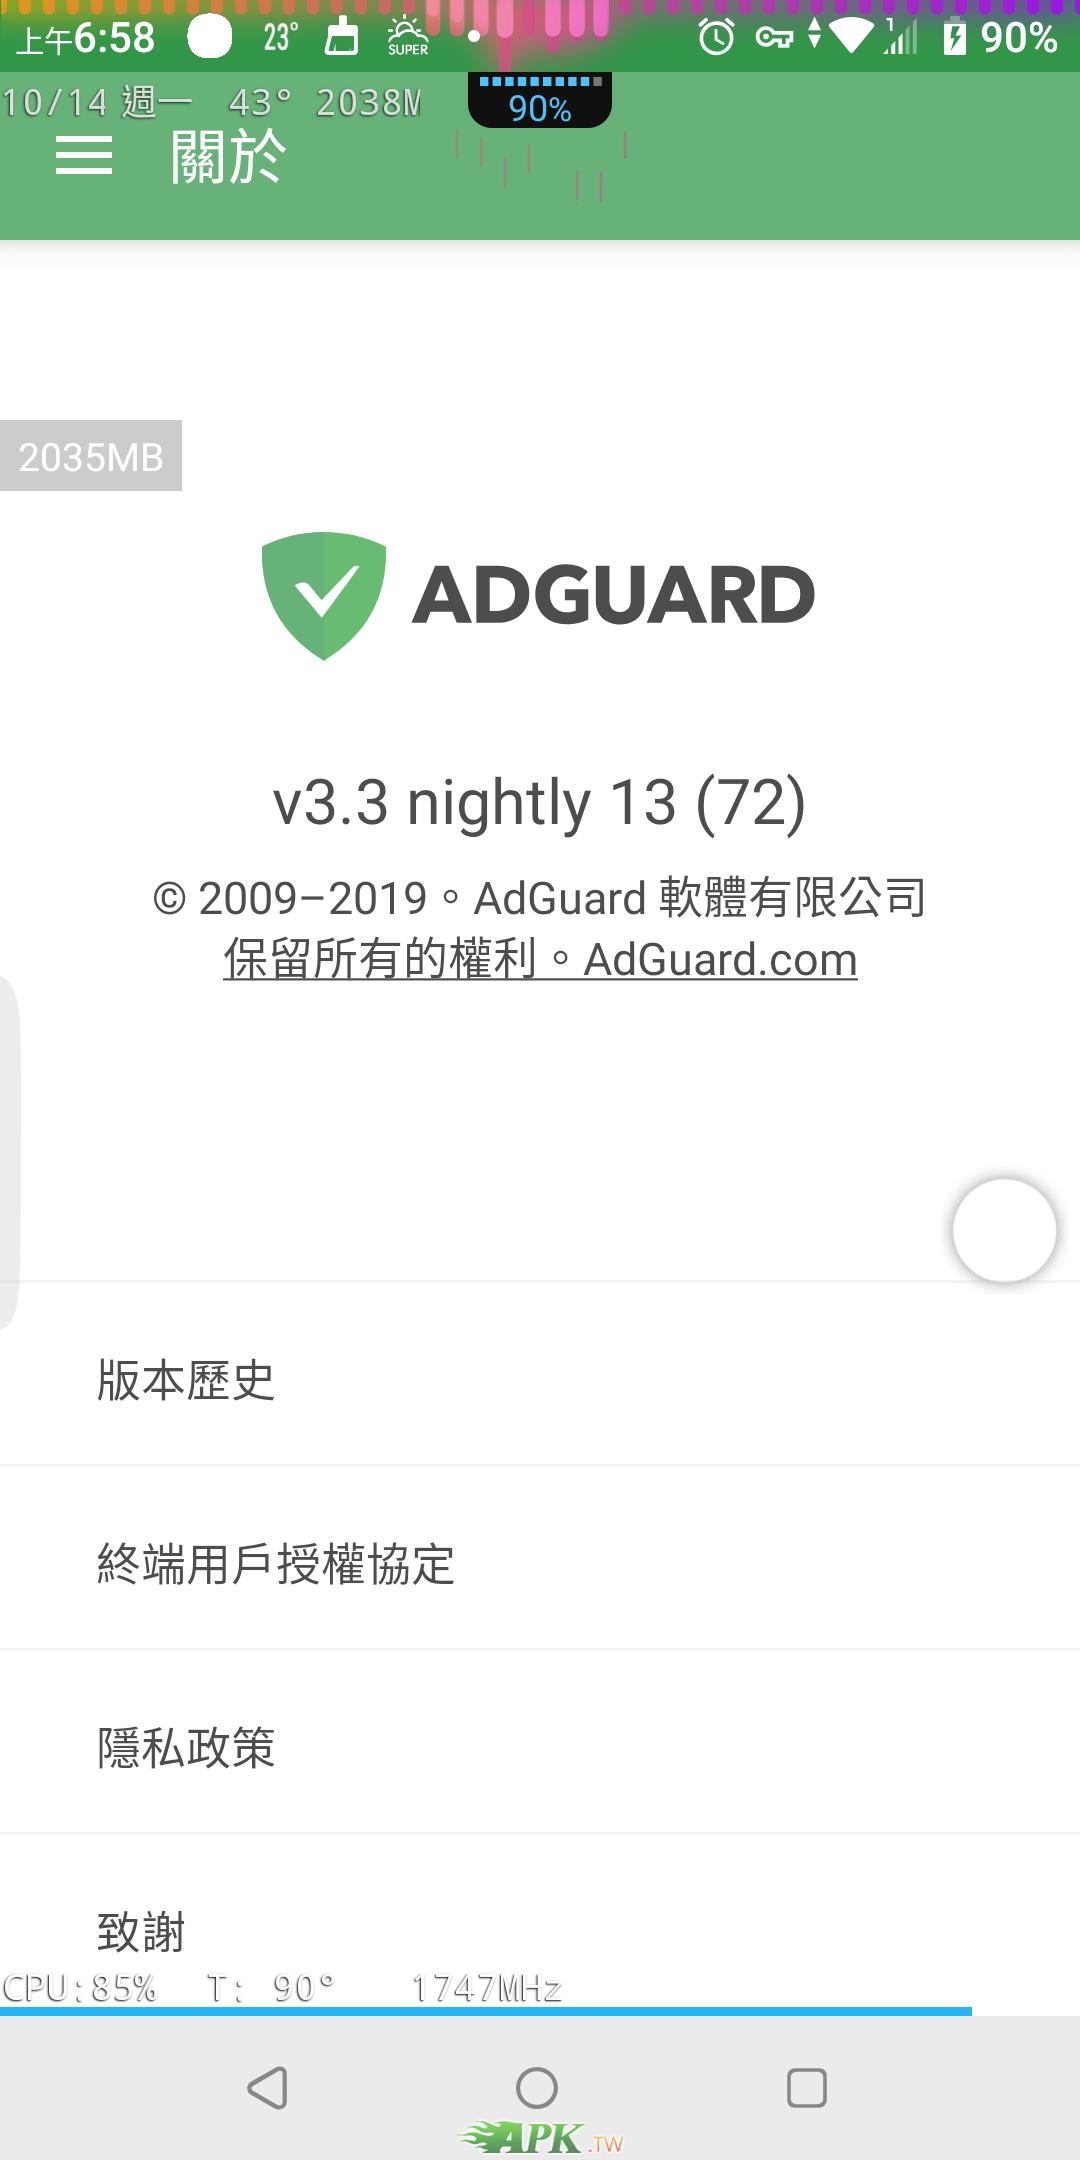 Screenshot_20191014-065810.png